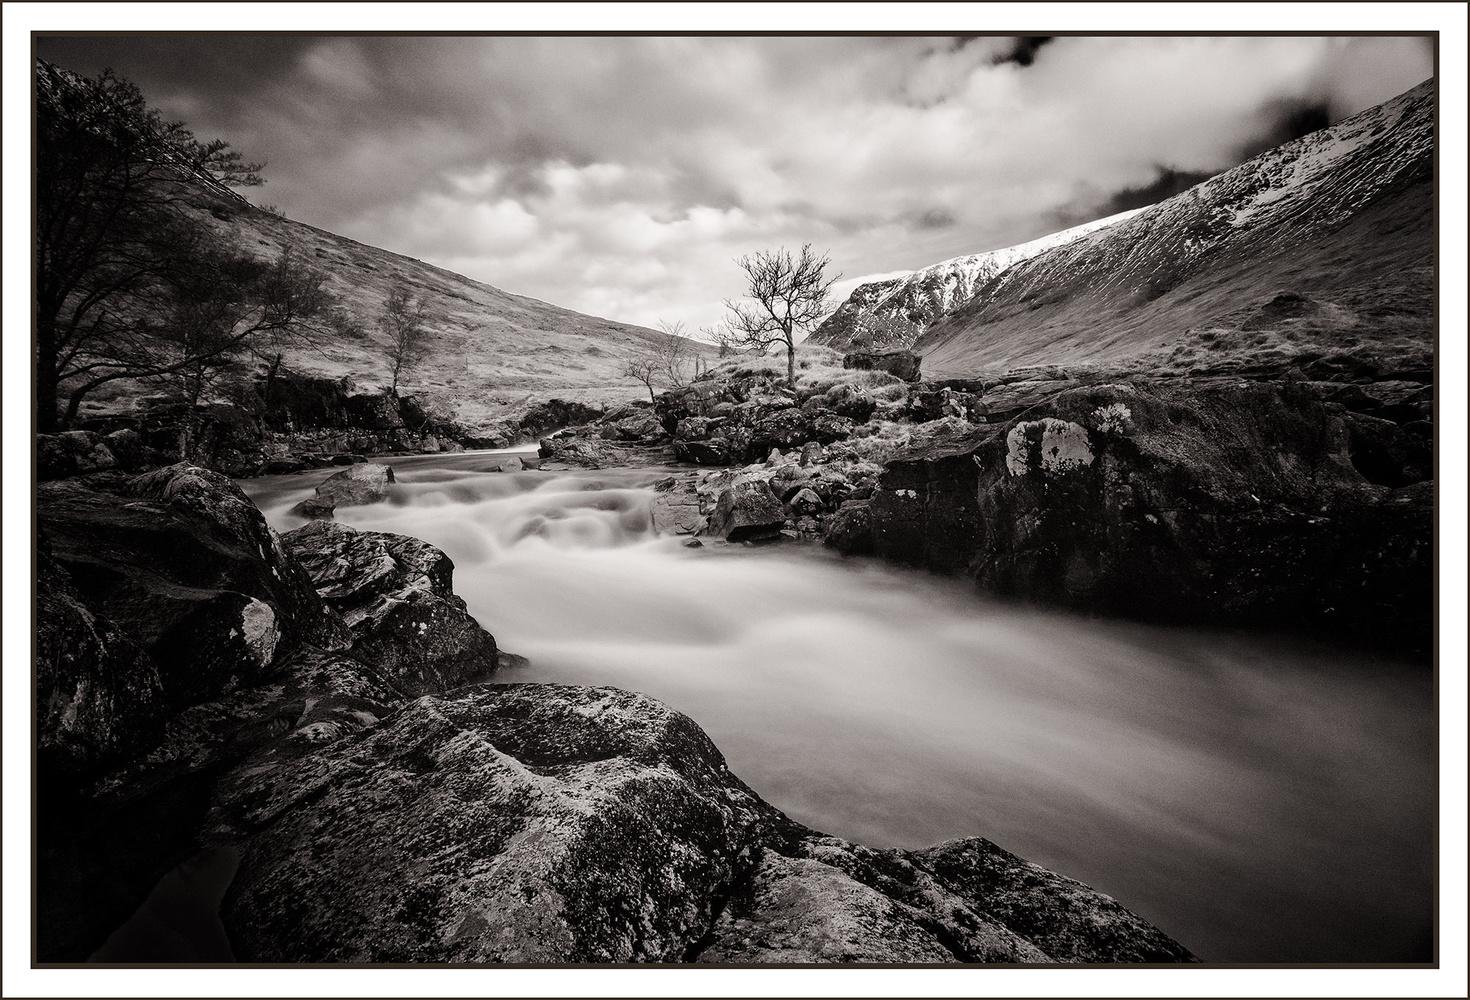 Rapids at Glen Etive by Anthony Hepworth